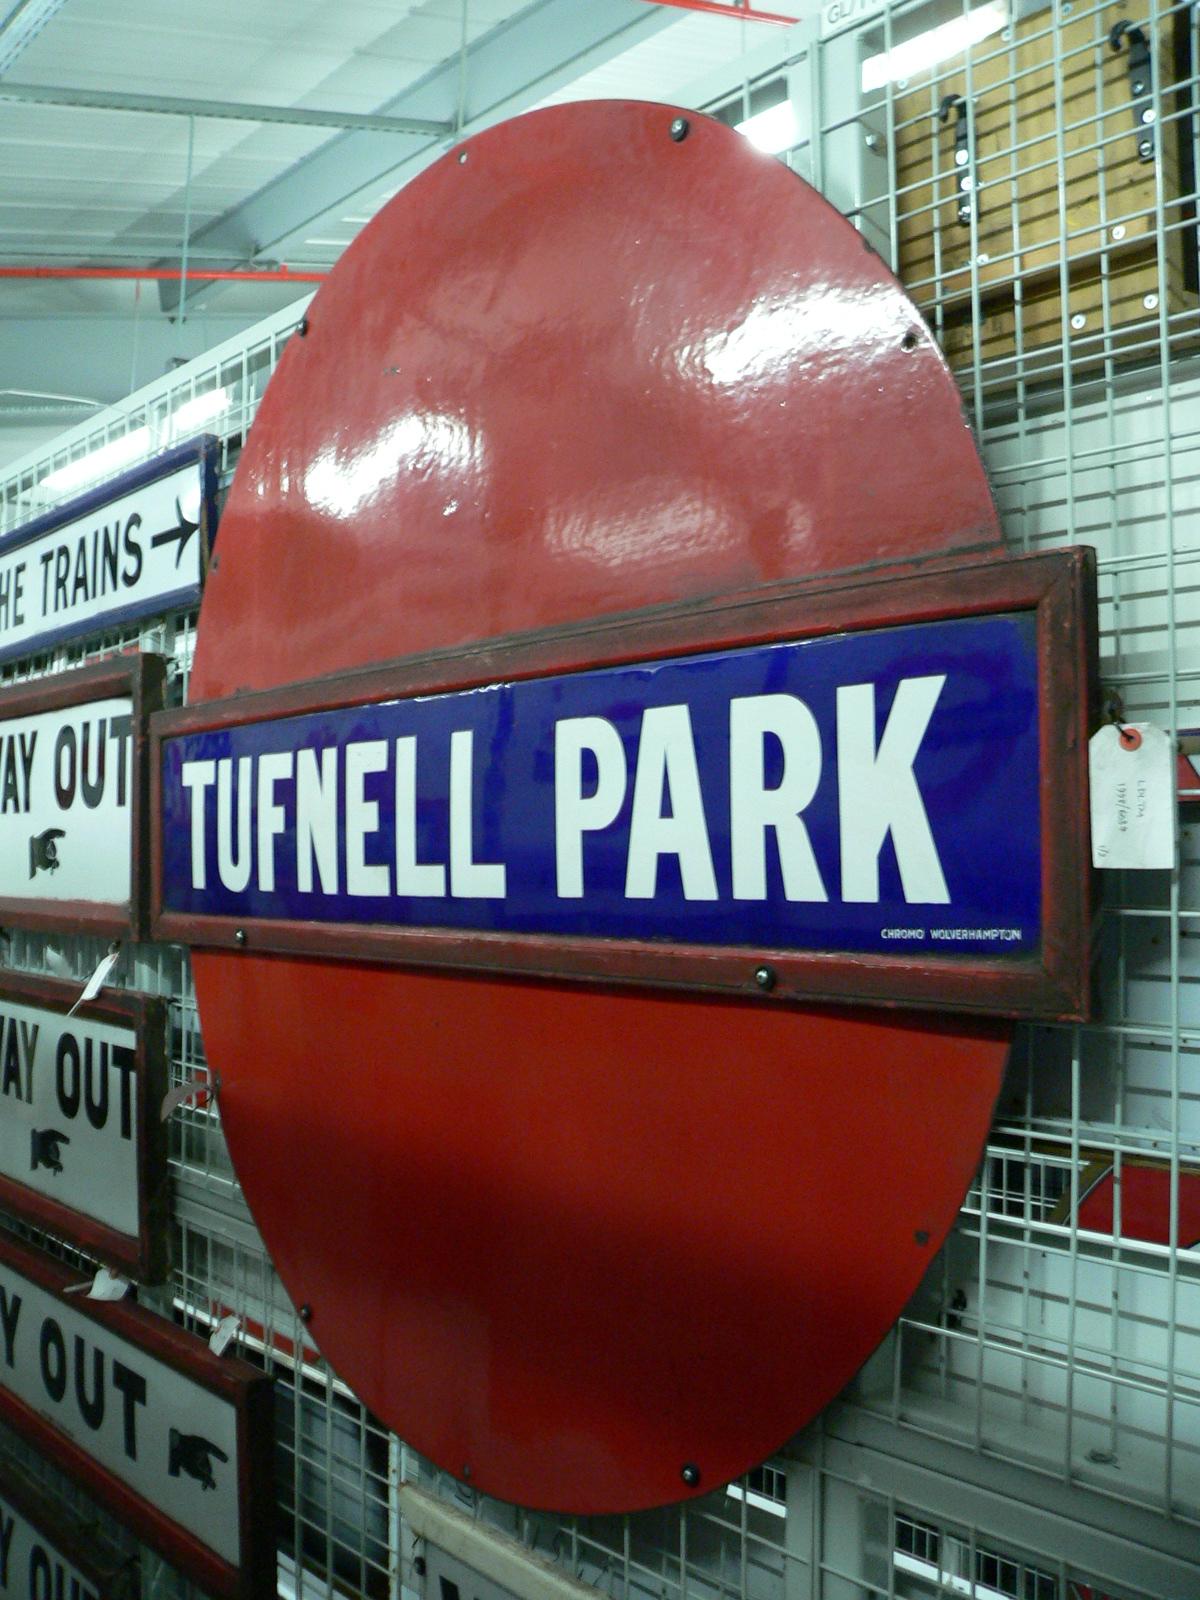 gb-ltmd-signs-tuffenel park.jpg